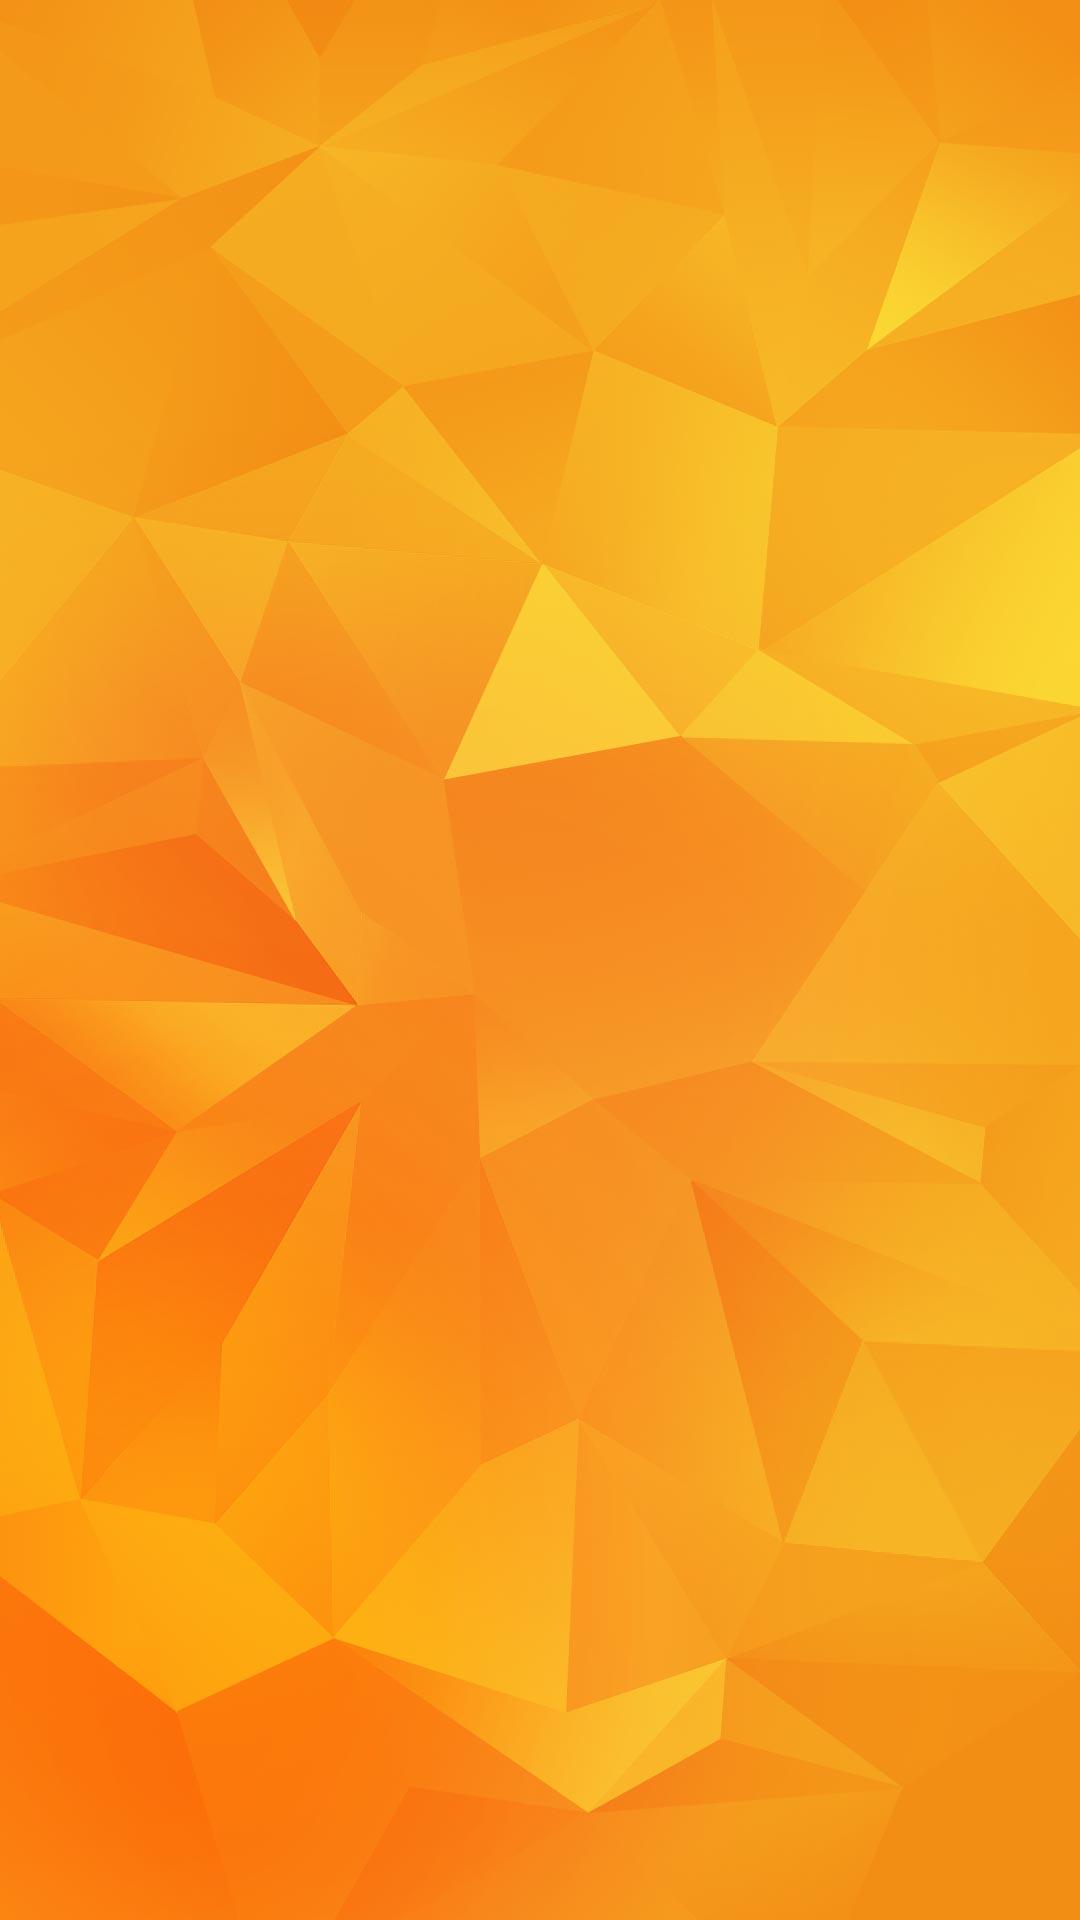 1080x1920px Samsung TV Wallpaper Mode - WallpaperSafari